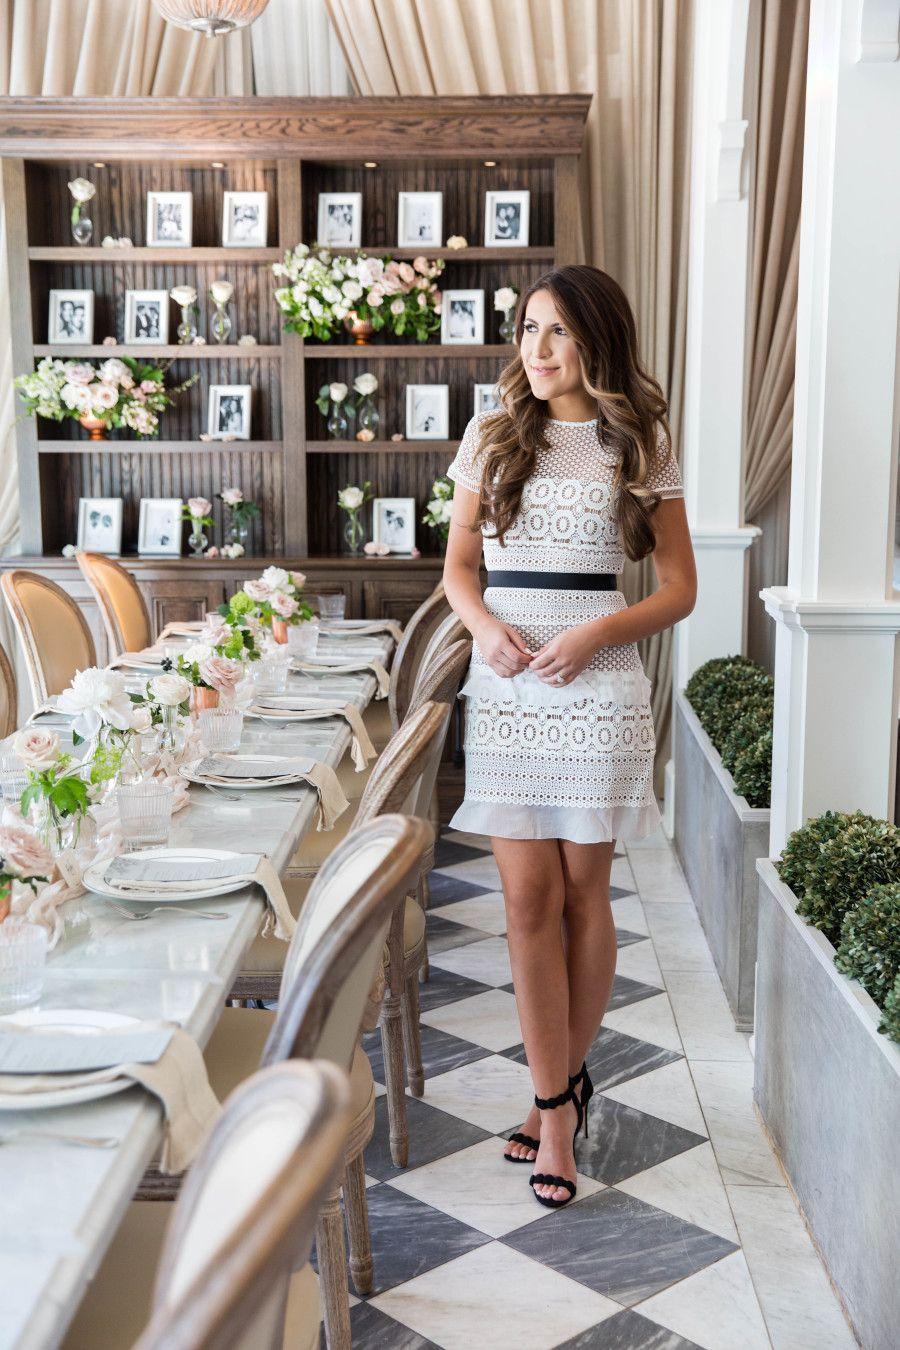 Peek Inside a Fashion Blogger's Bridal Shower Brunch